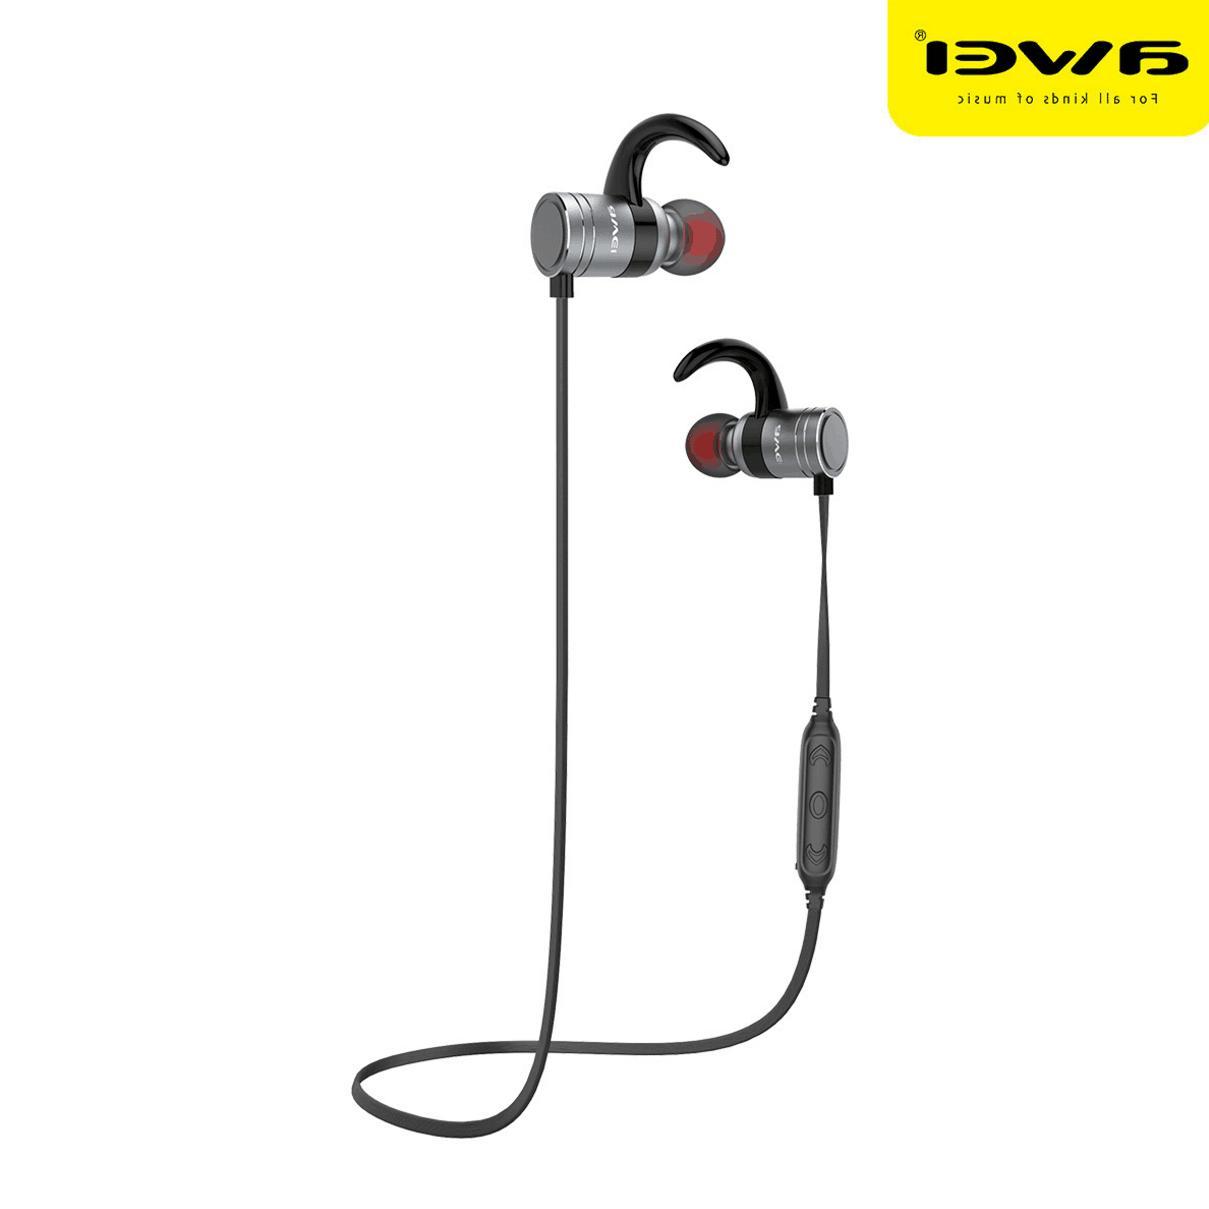 bluetooth earbuds wireless stereo earphones sport headphones